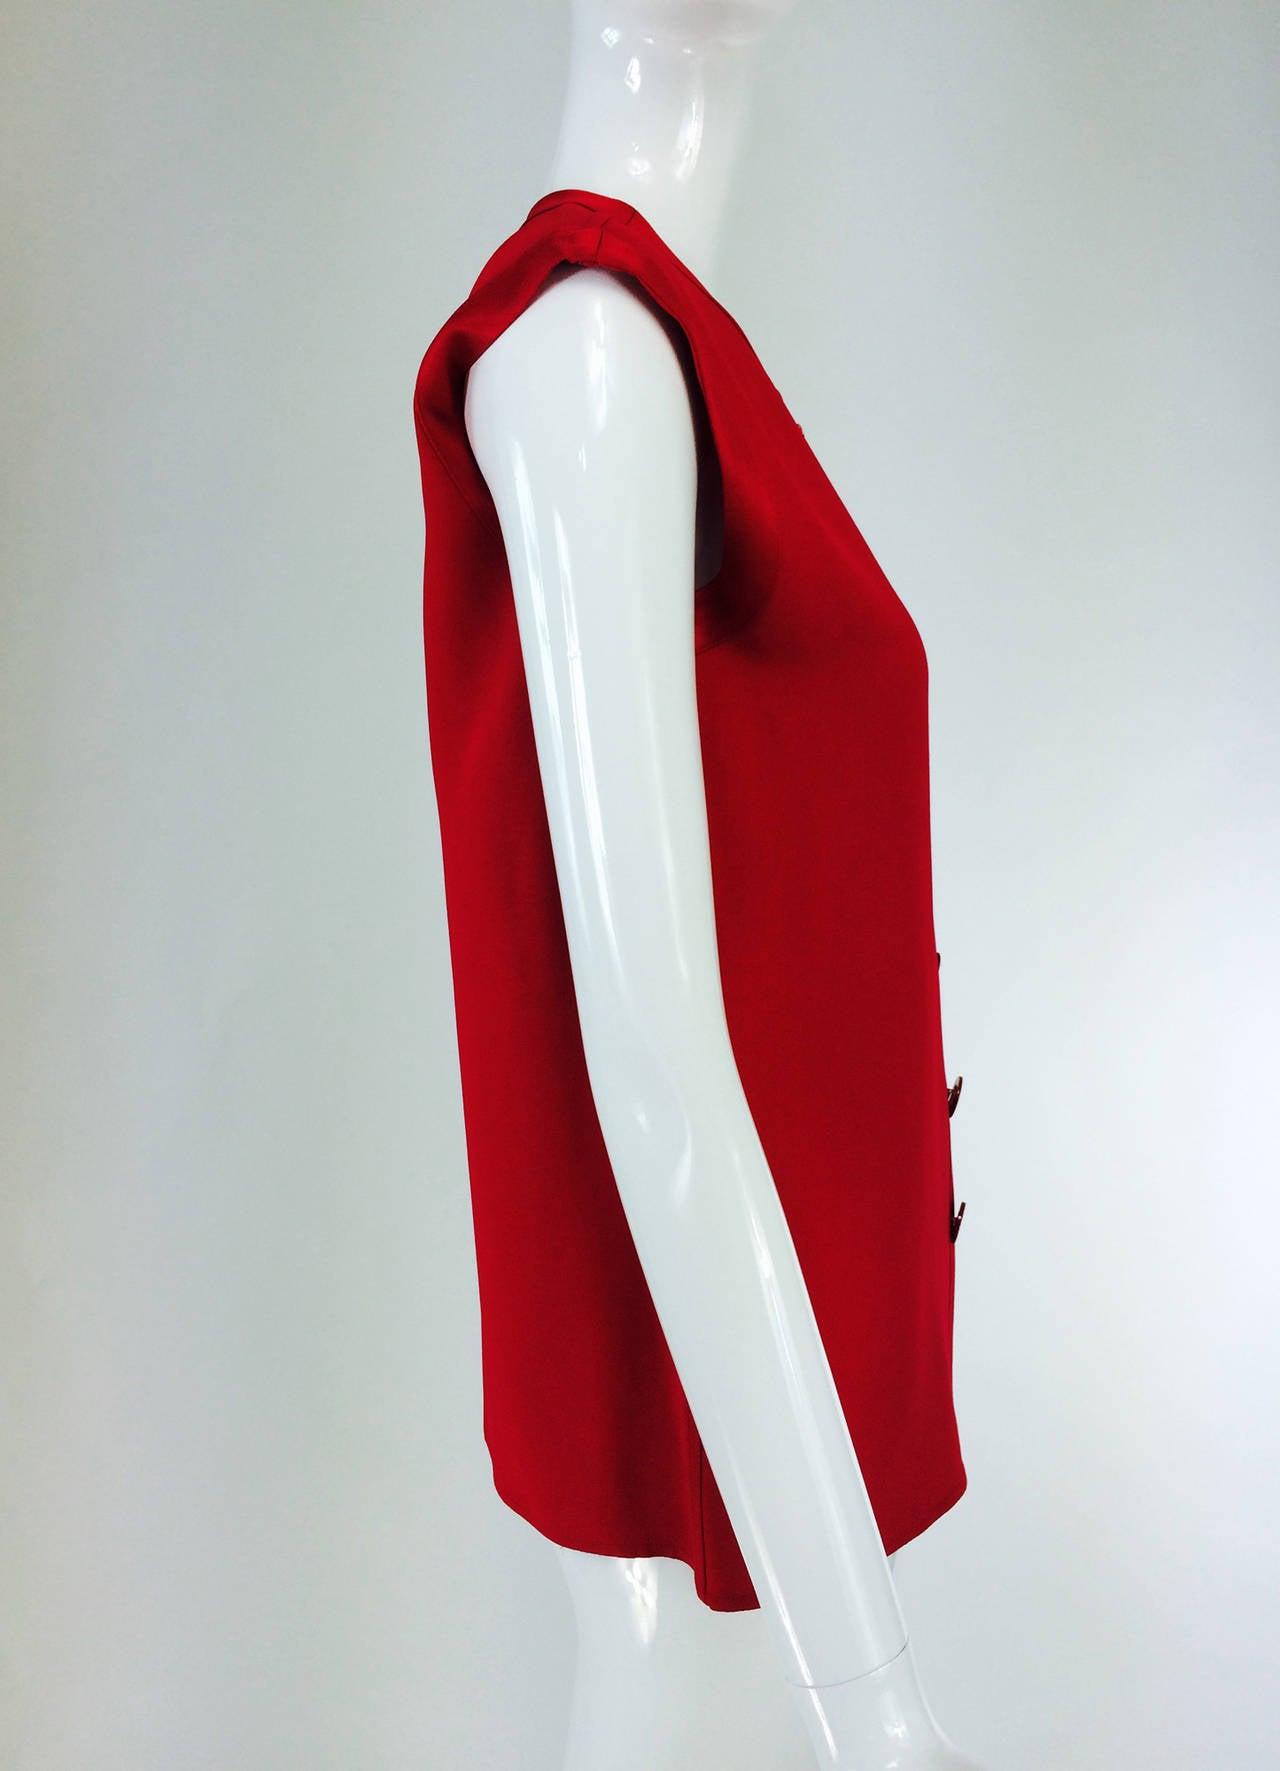 Yves St Laurent YSL Rive Gauche red satin back crepe sleeveless top 3